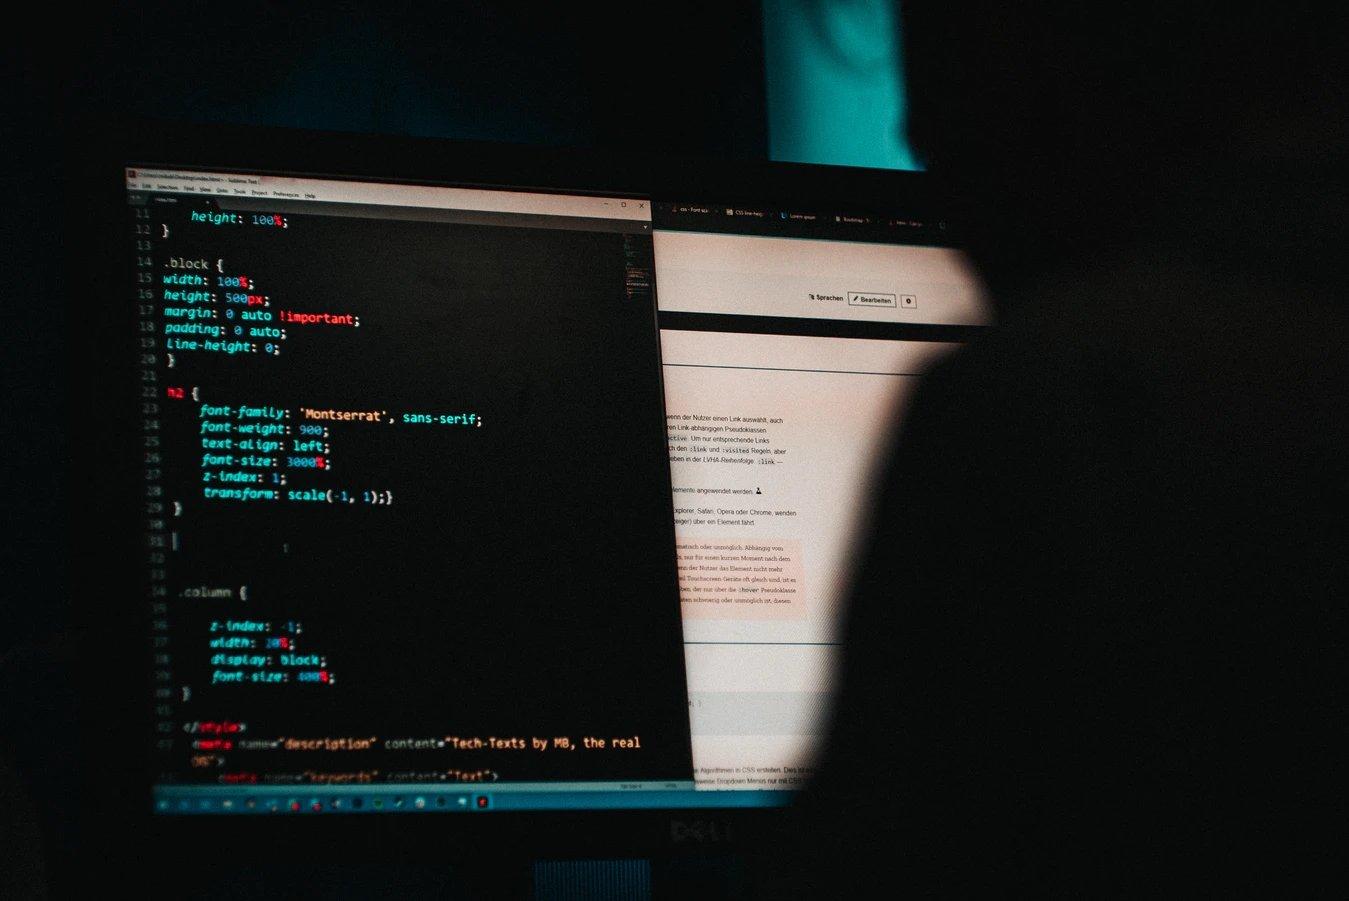 código malicioso hacker